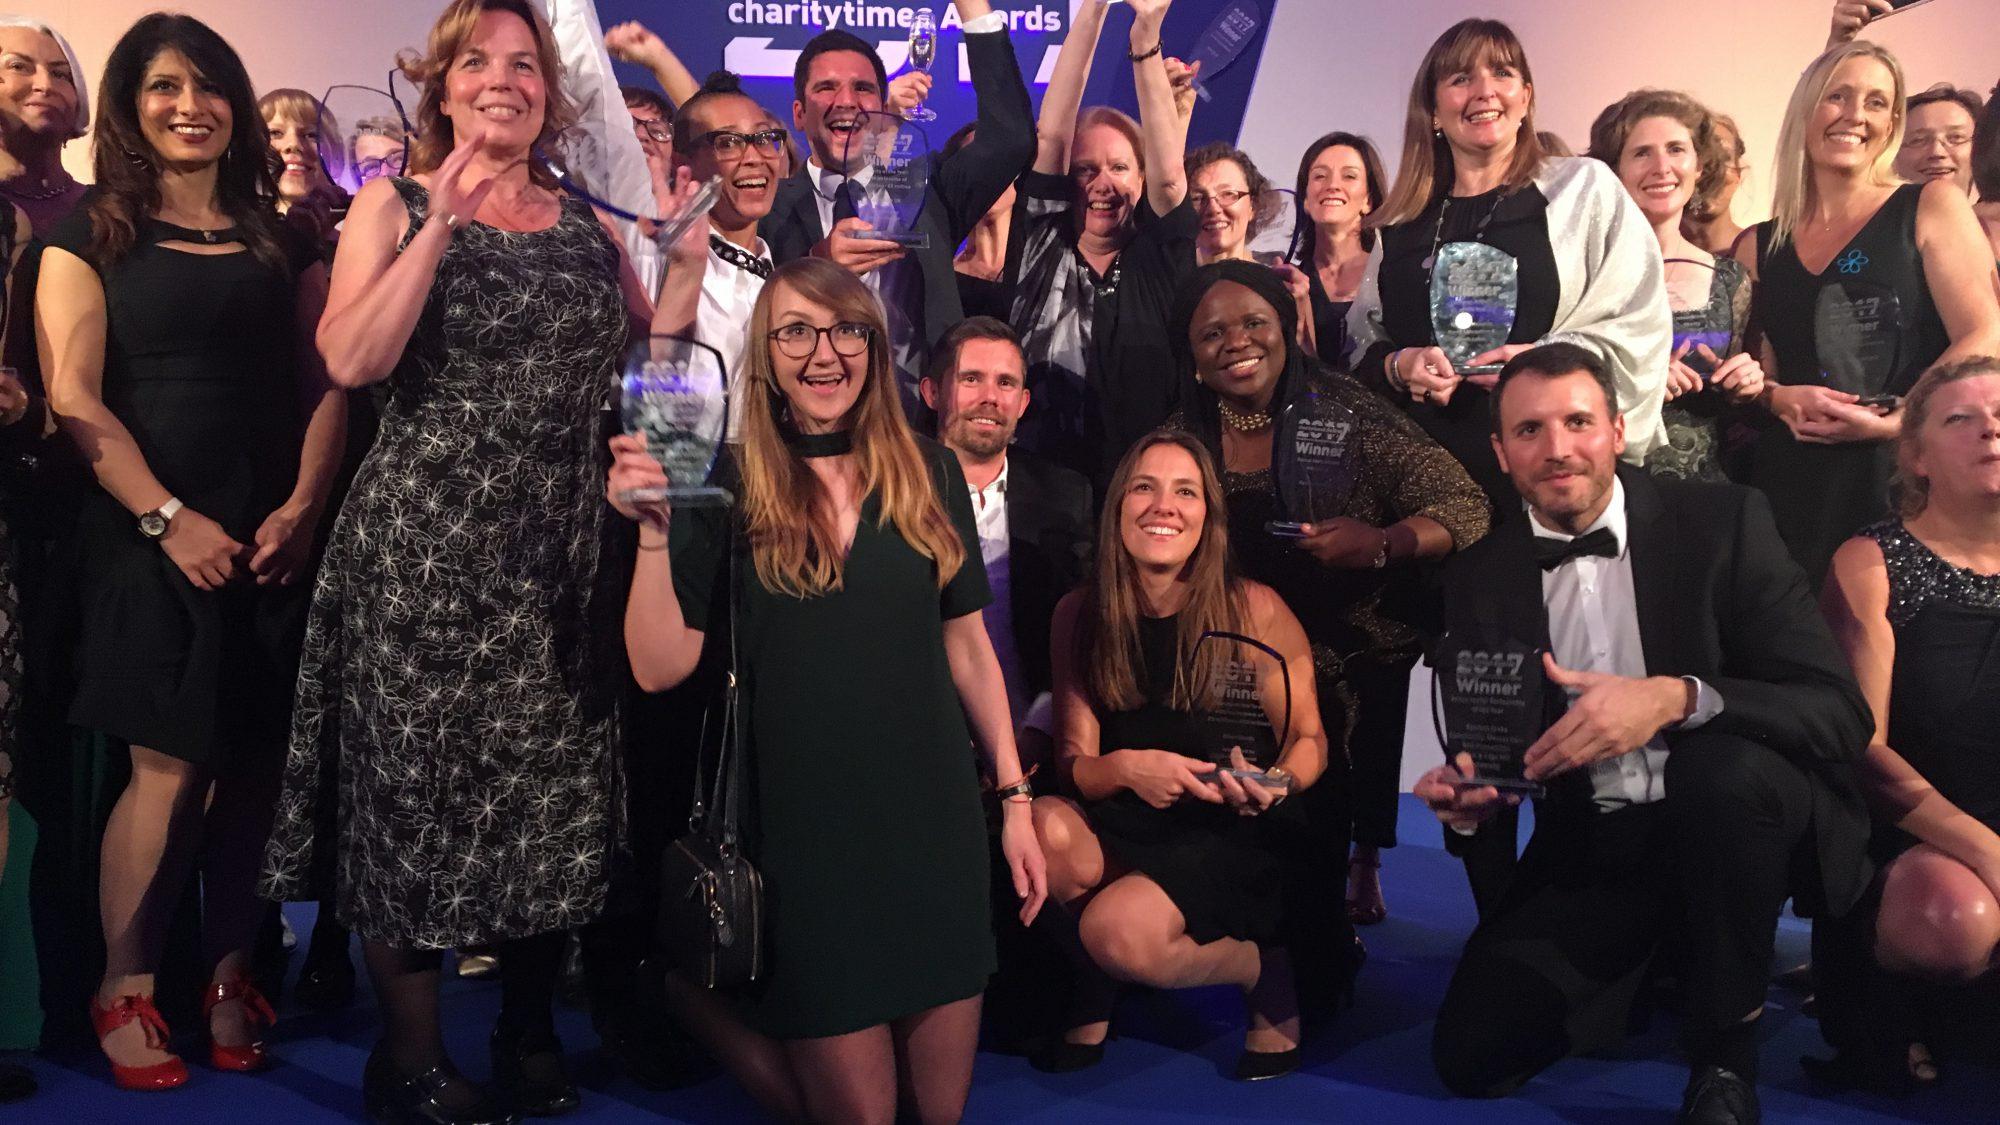 Group photo at EVCOM Awards 2017